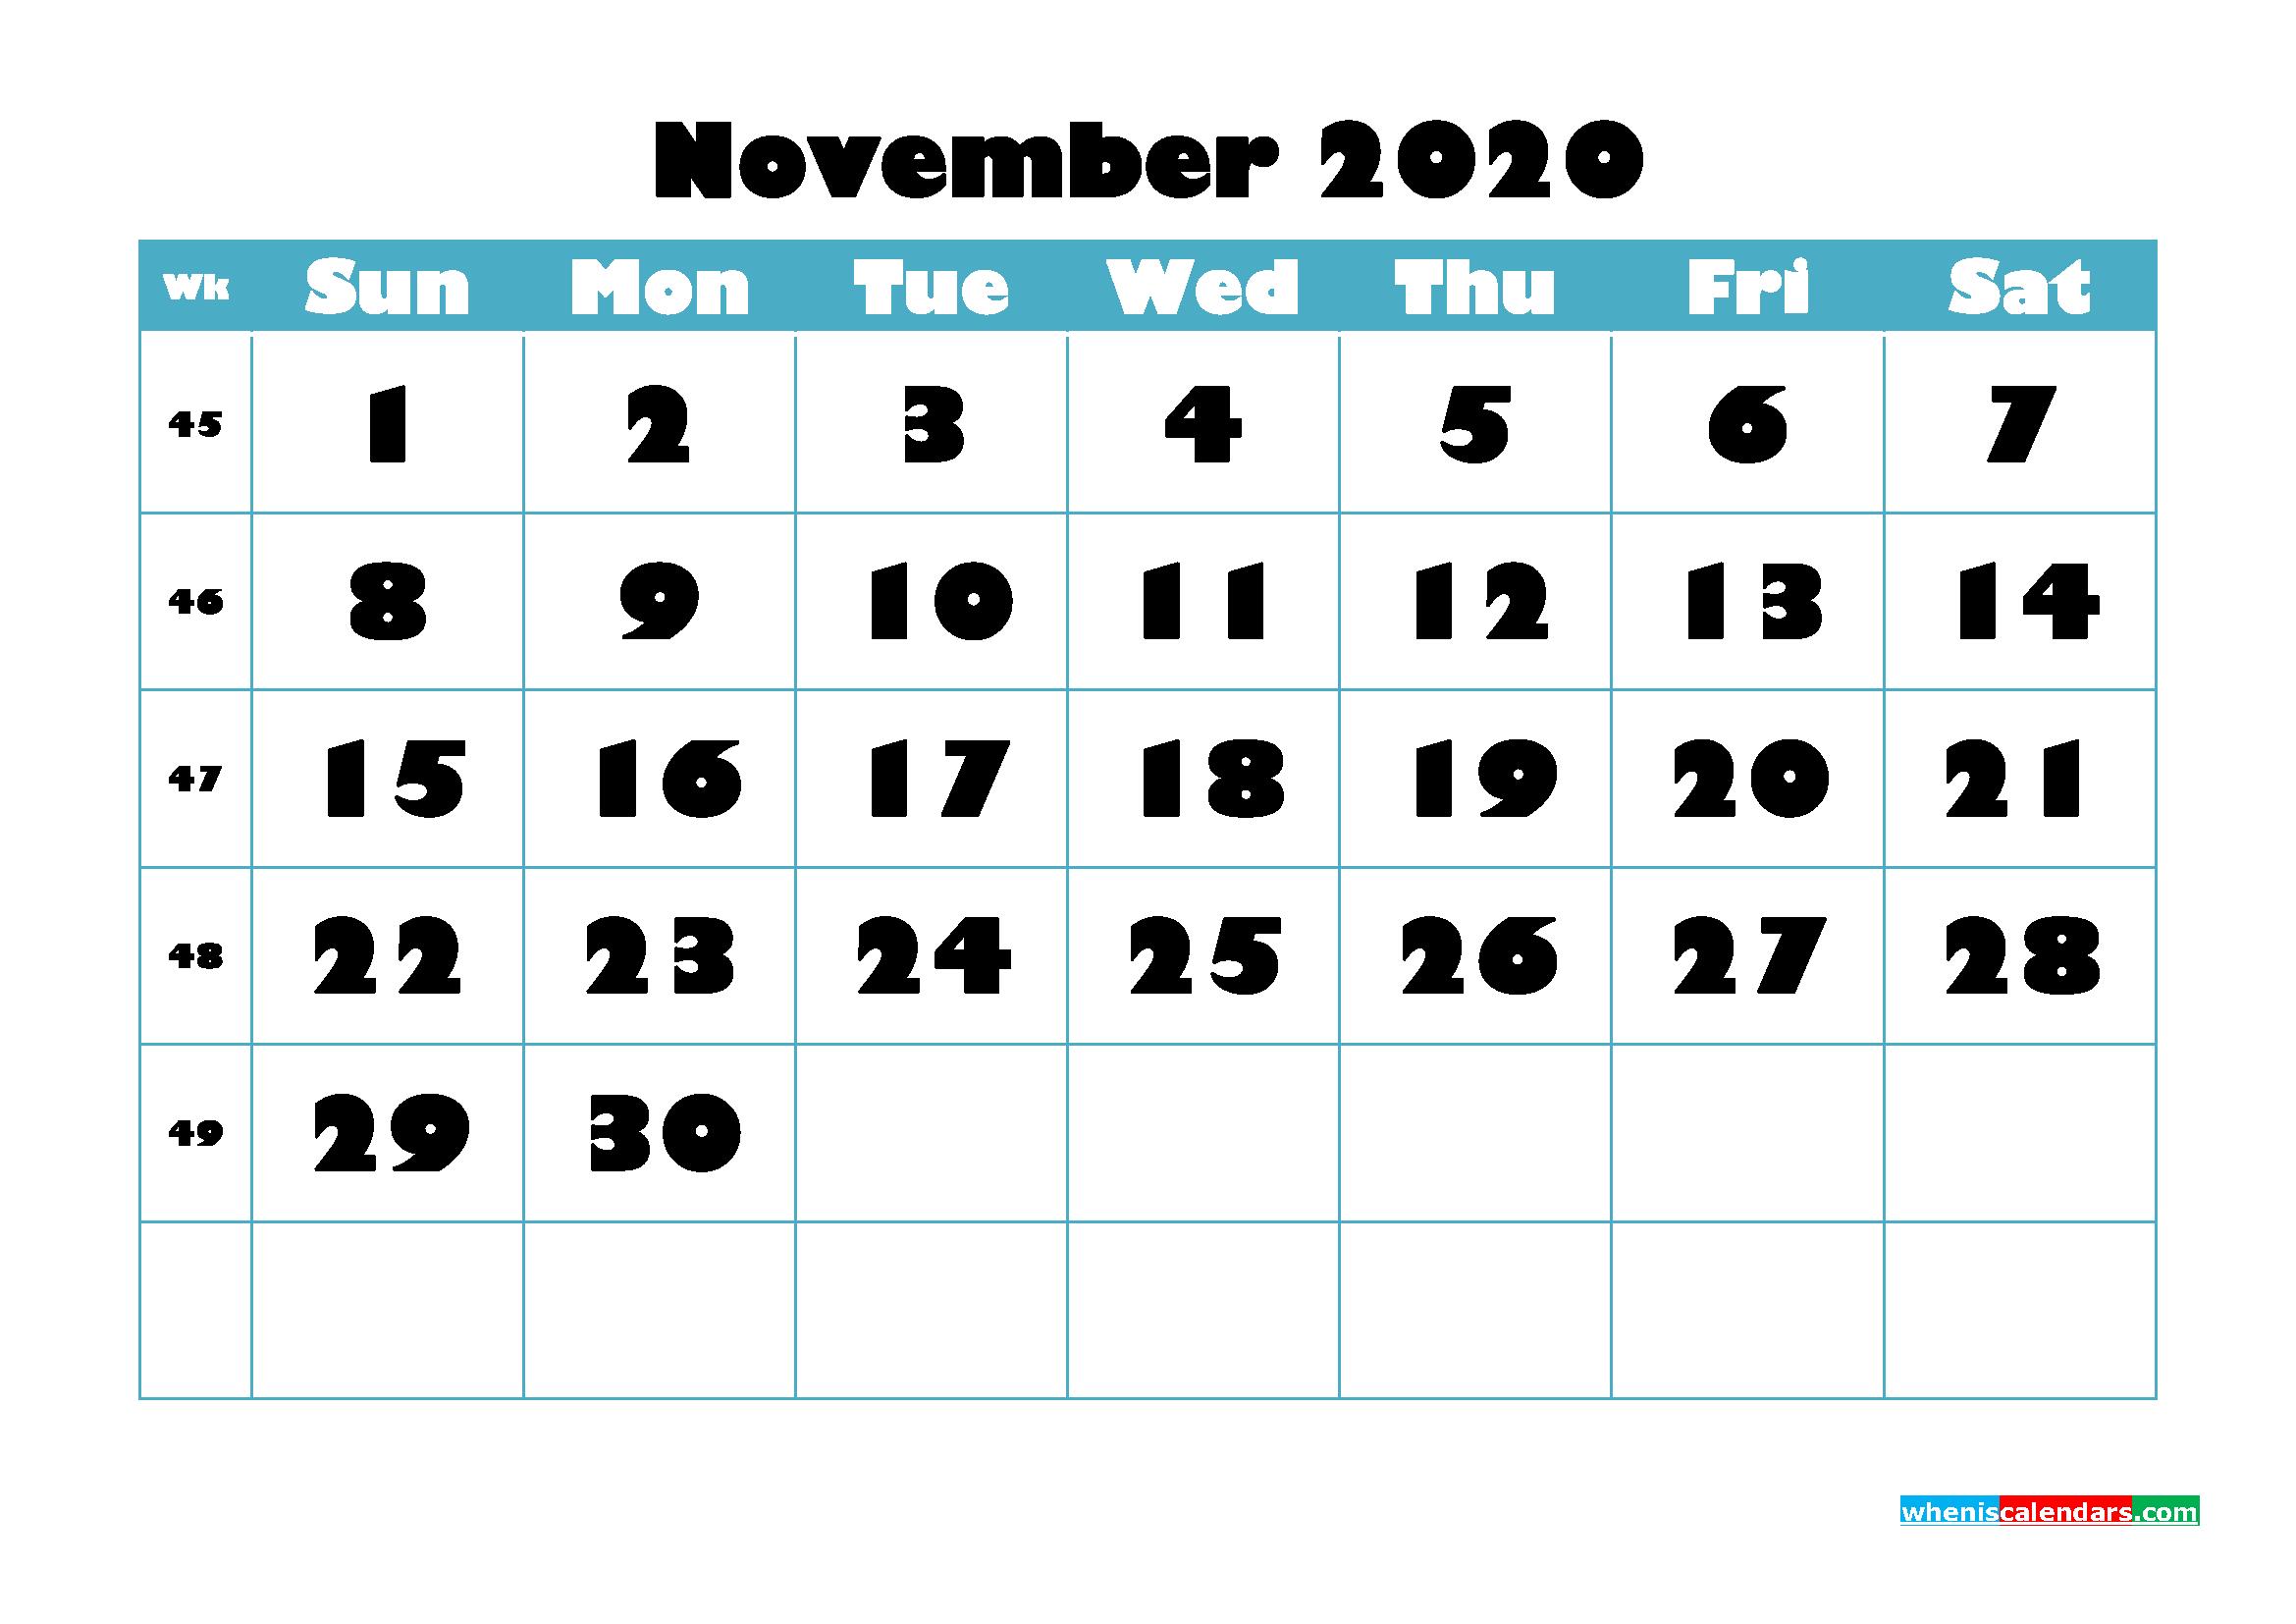 Free Blank Calendar November 2020 Printable - No.m20b767